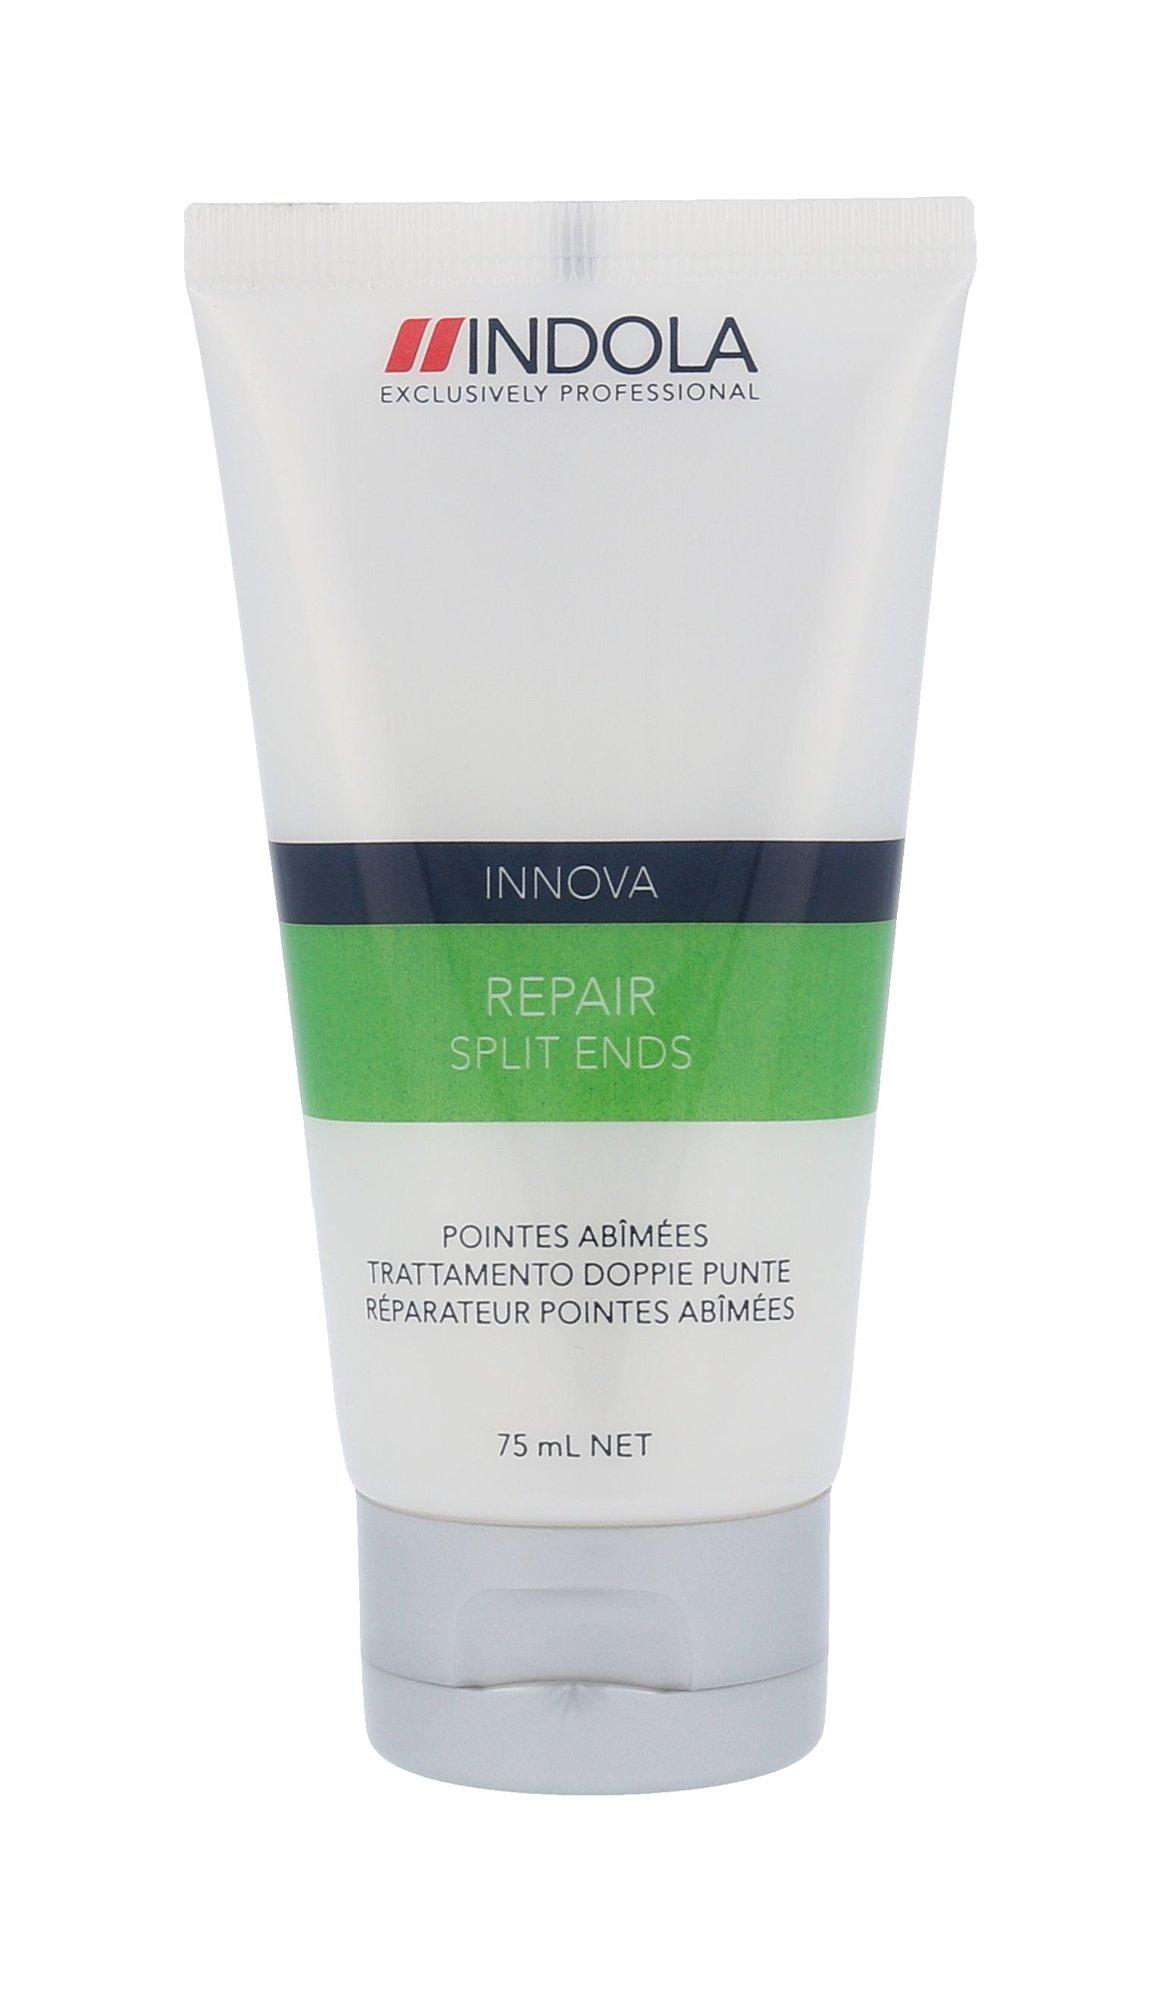 Indola Innova Repair Cosmetic 75ml  Split Ends